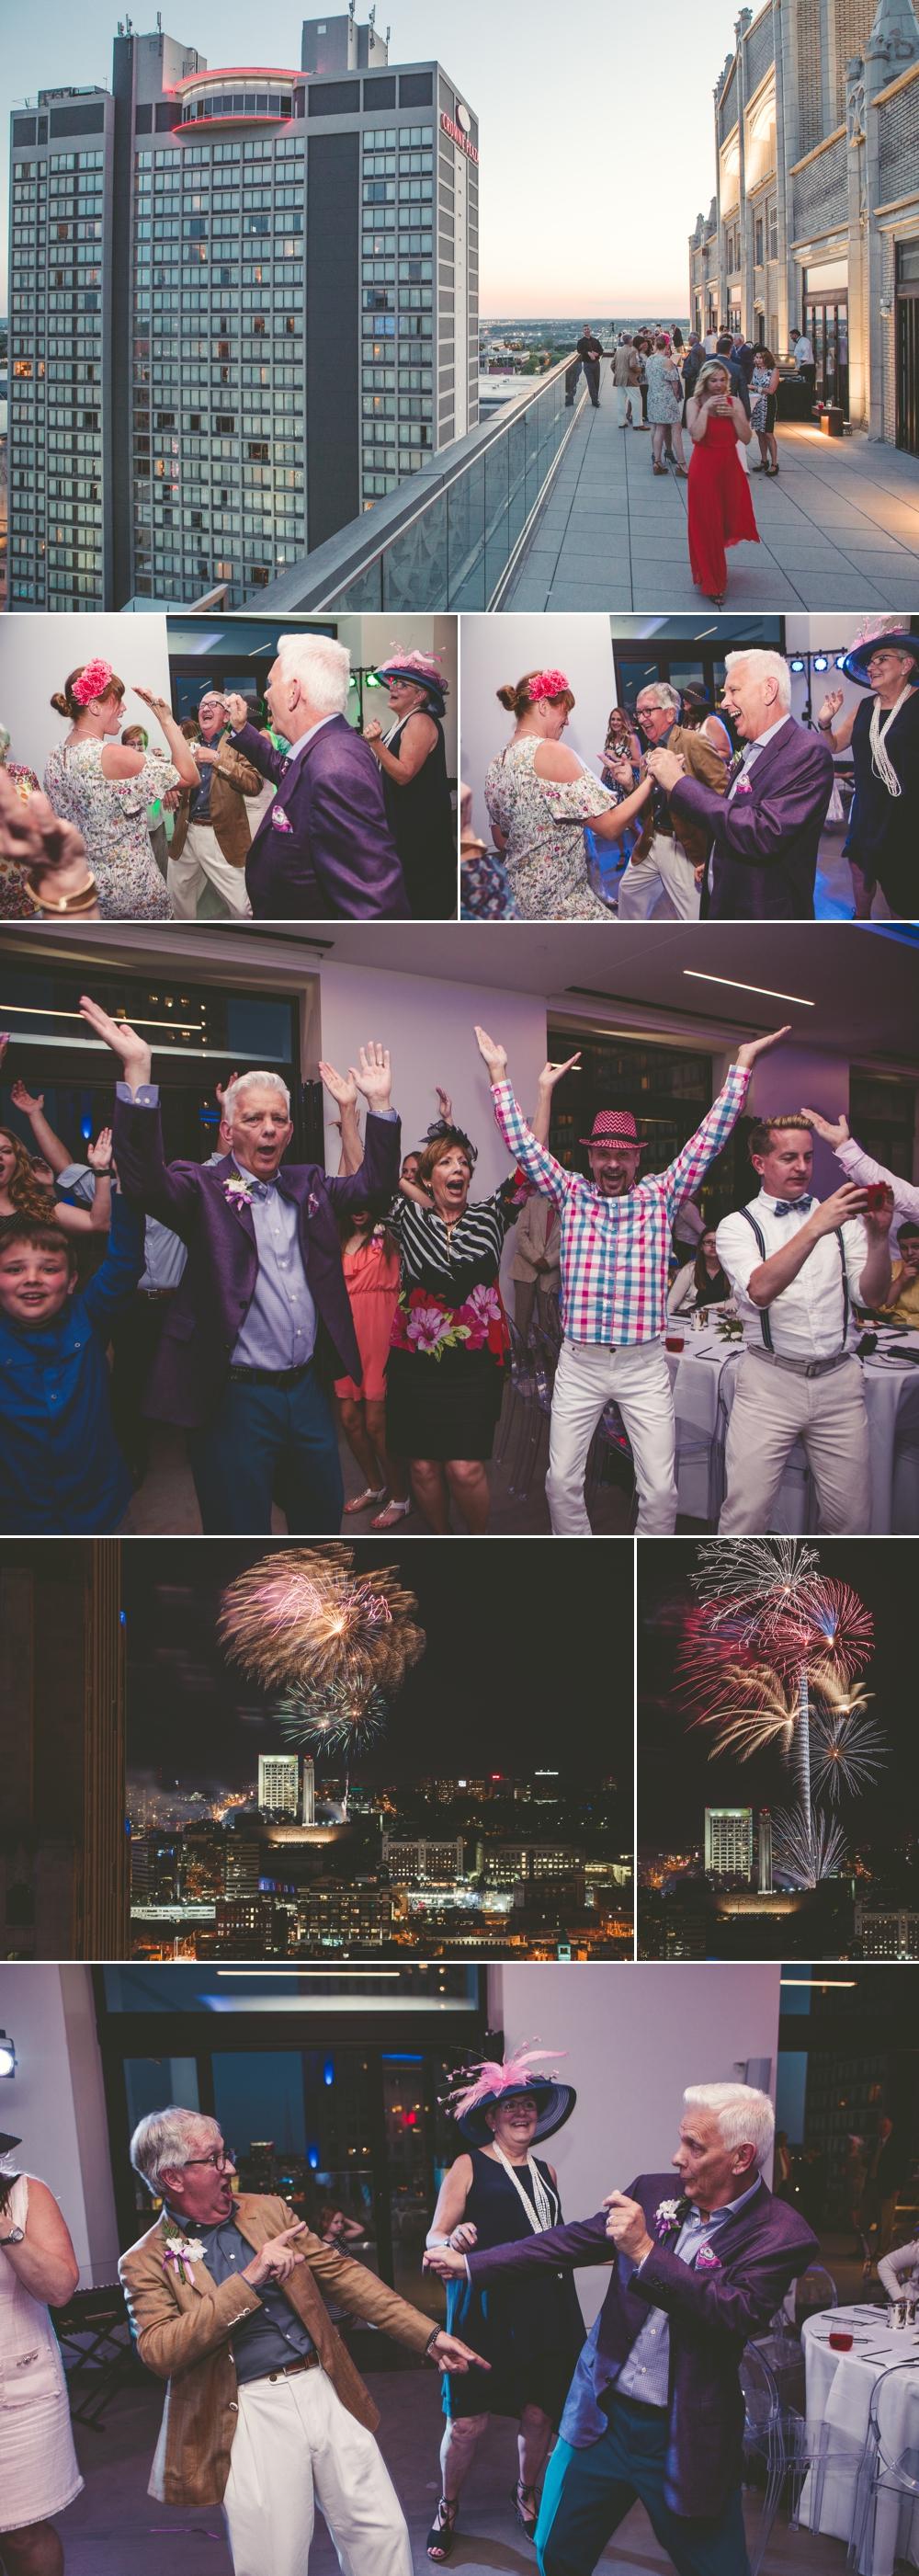 jason_domingues_photography_best_kansas_city_photographer_kc_weddings_same_sex_wedding_brass_on_baltimore_love_wins0003.jpg